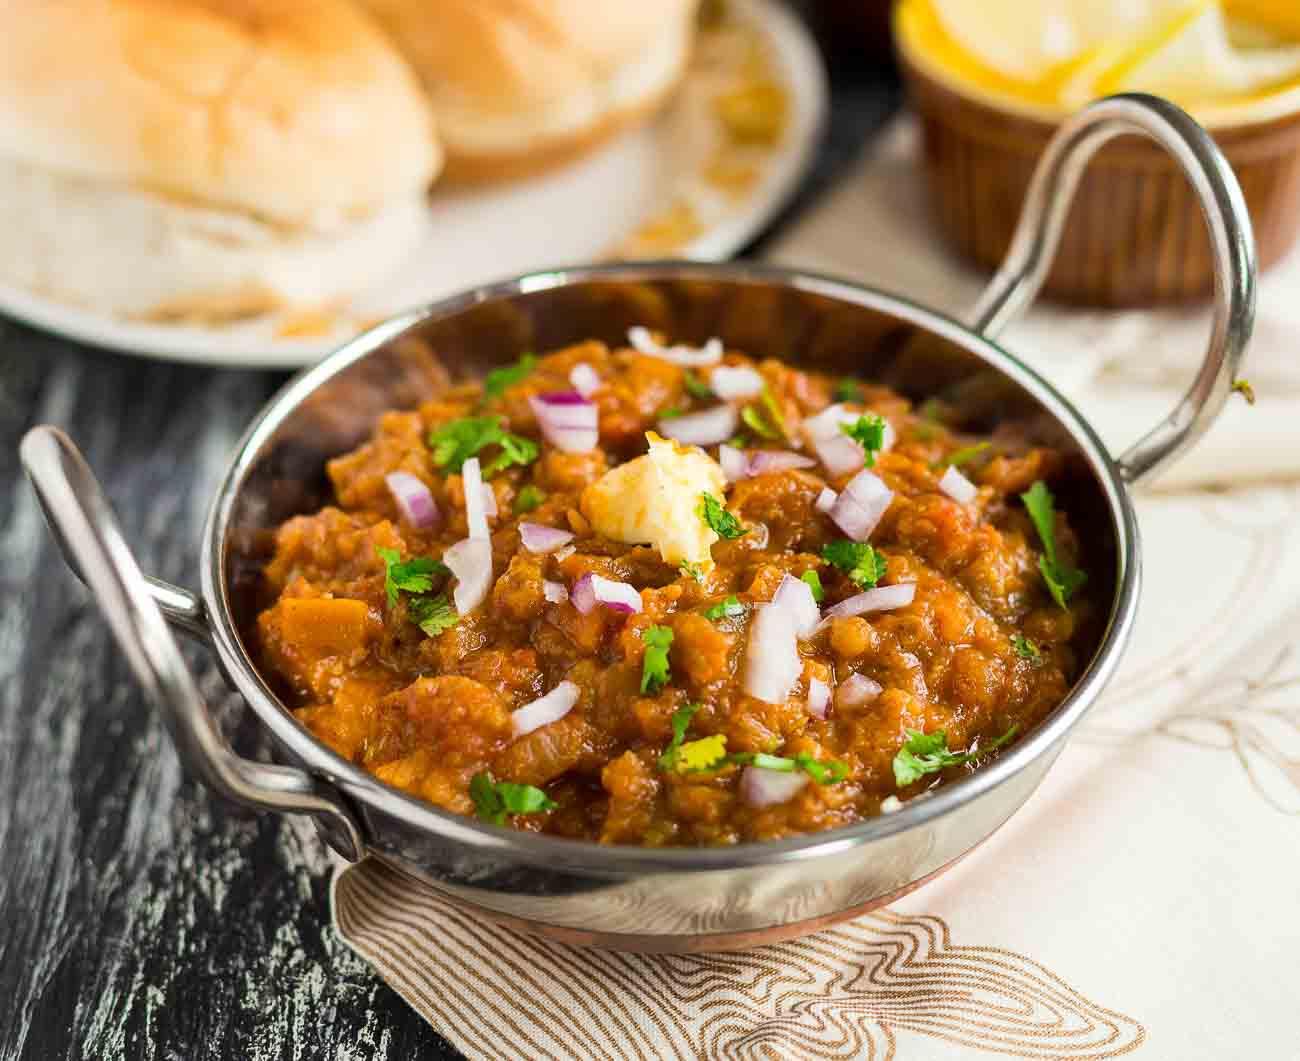 One pot pav bhaji recipe using preethi electric pressure cooker by one pot pav bhaji recipe using preethi electric pressure cooker by archanas kitchen forumfinder Images